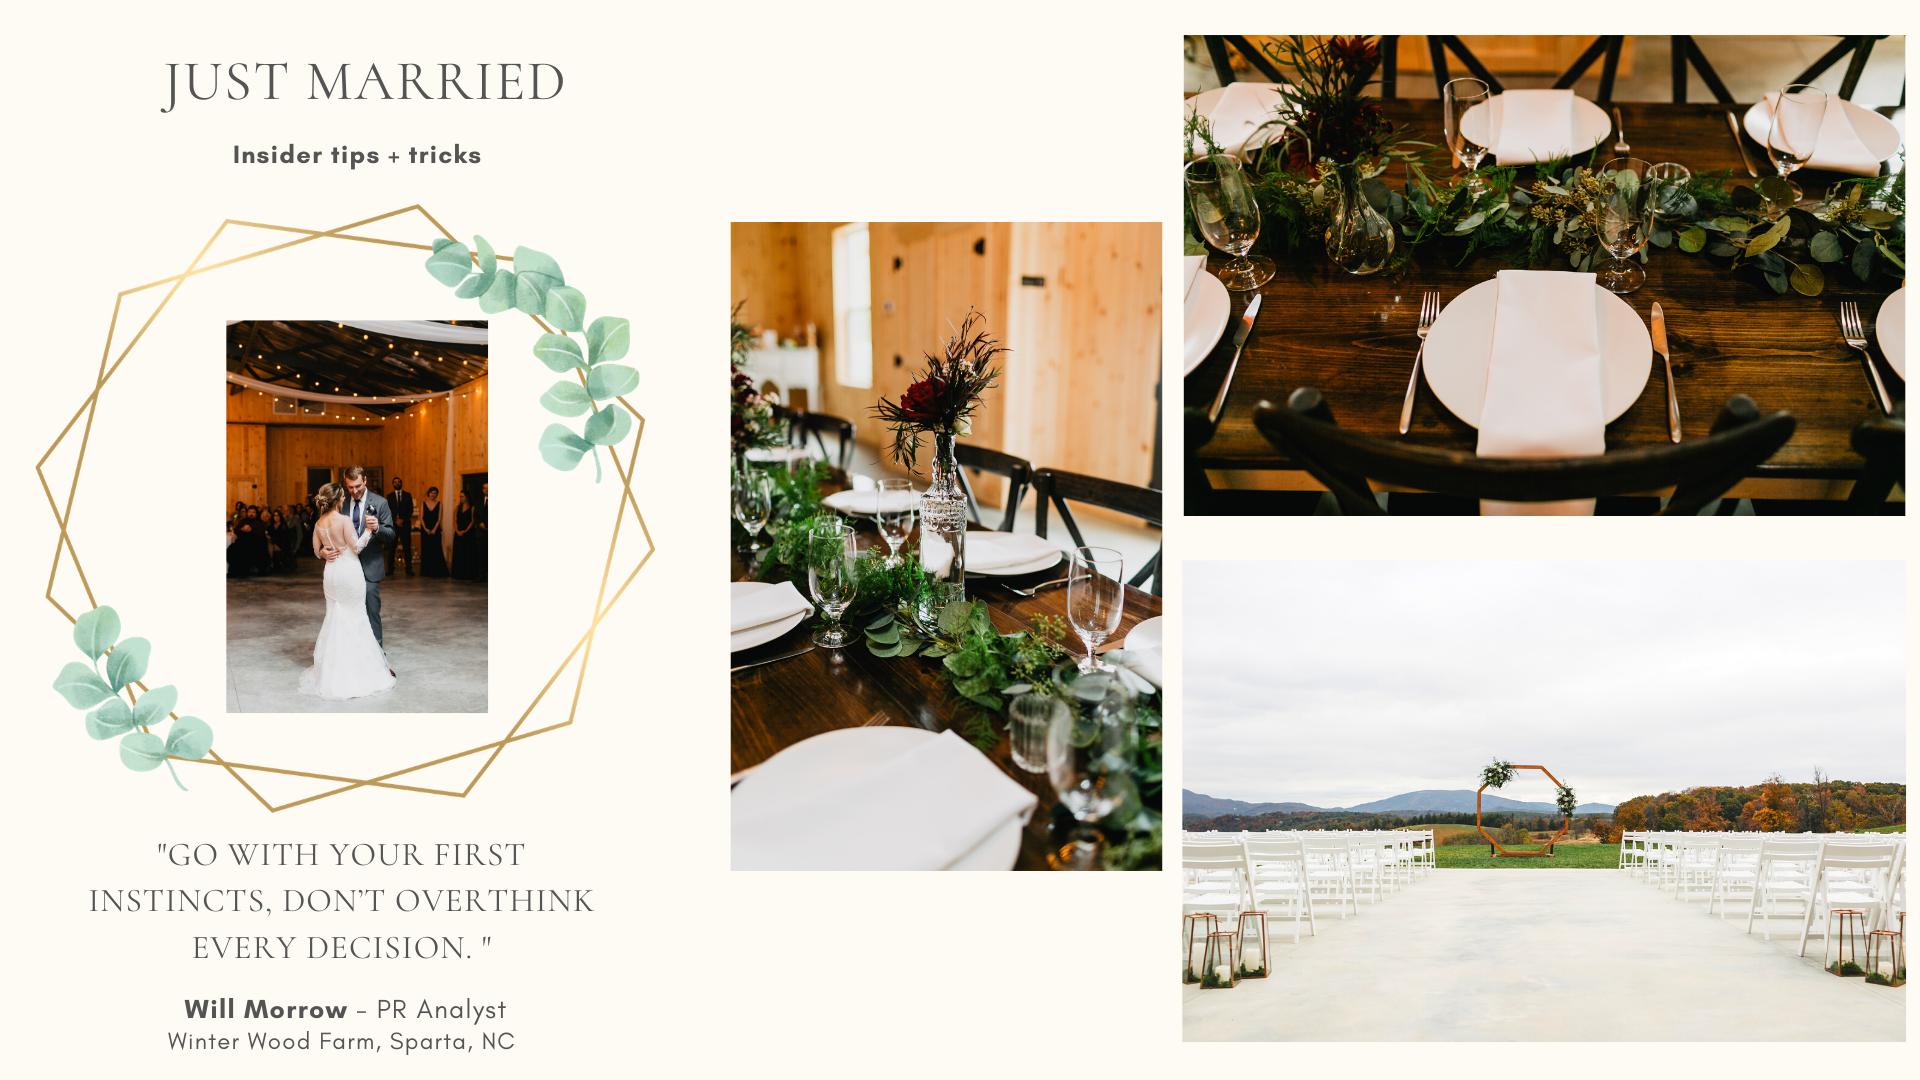 Wedding Rentals - Just Married